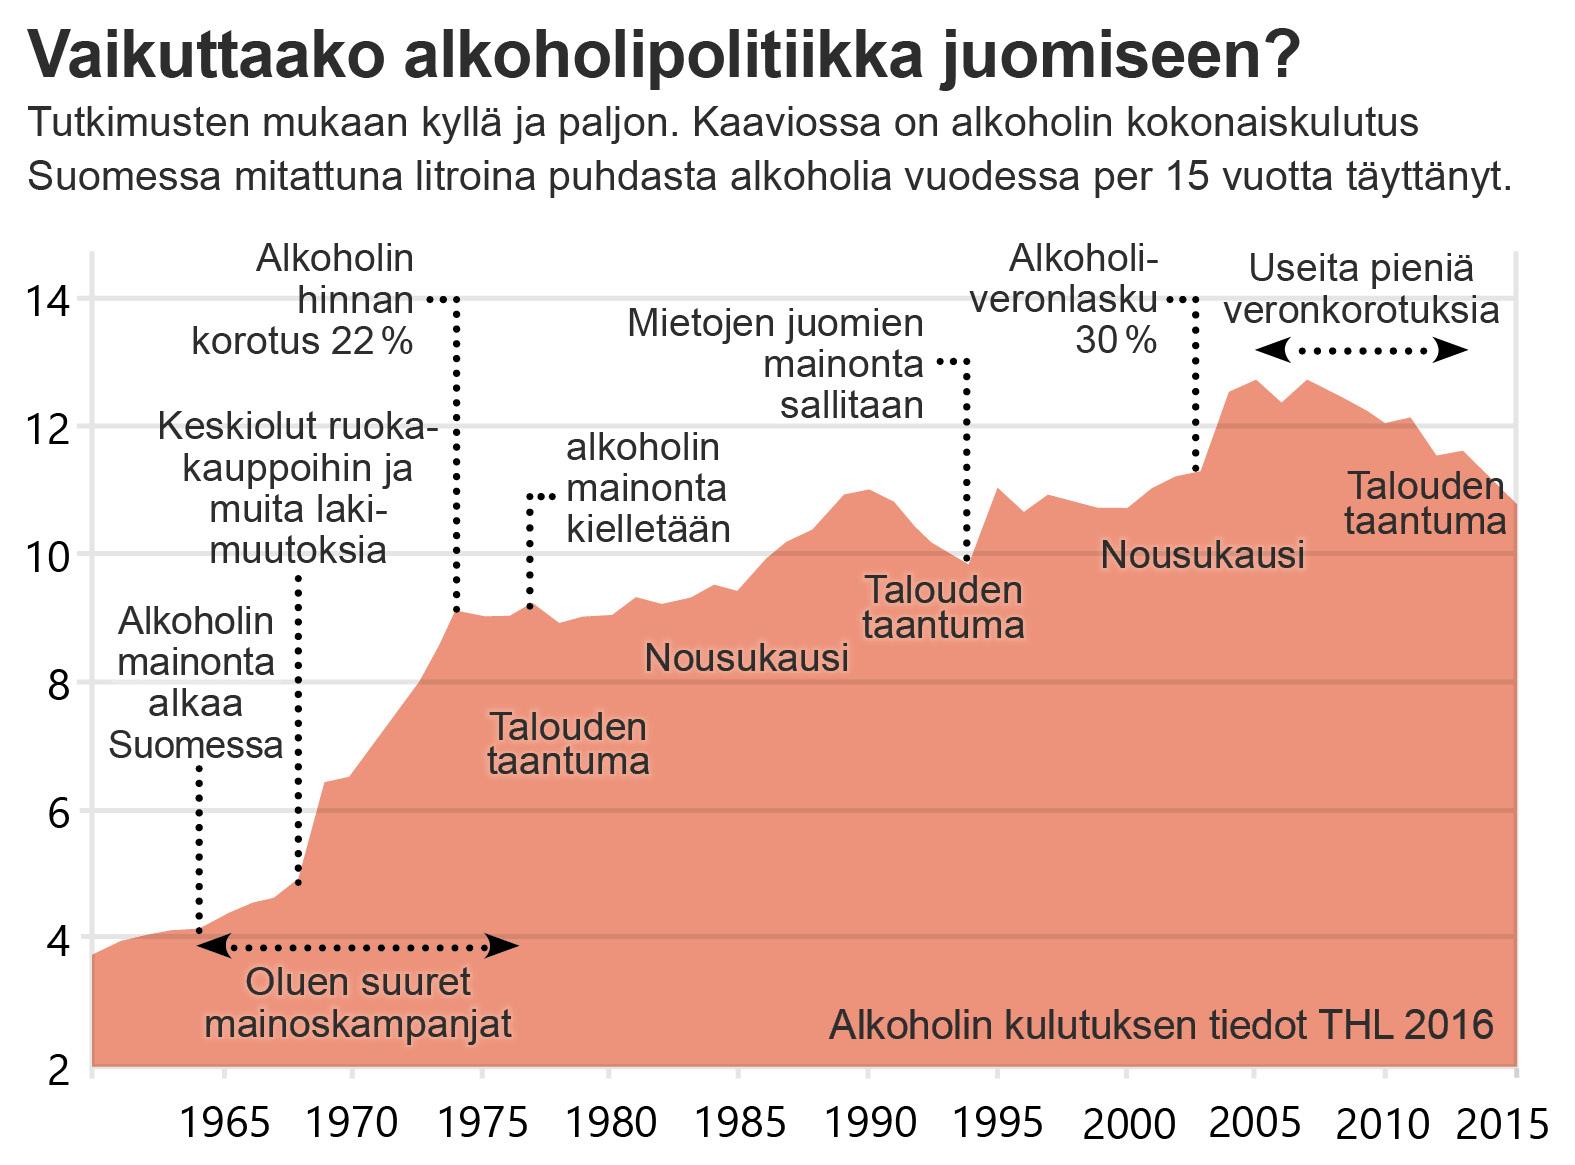 Suomen alkoholihistoria 1960-2015